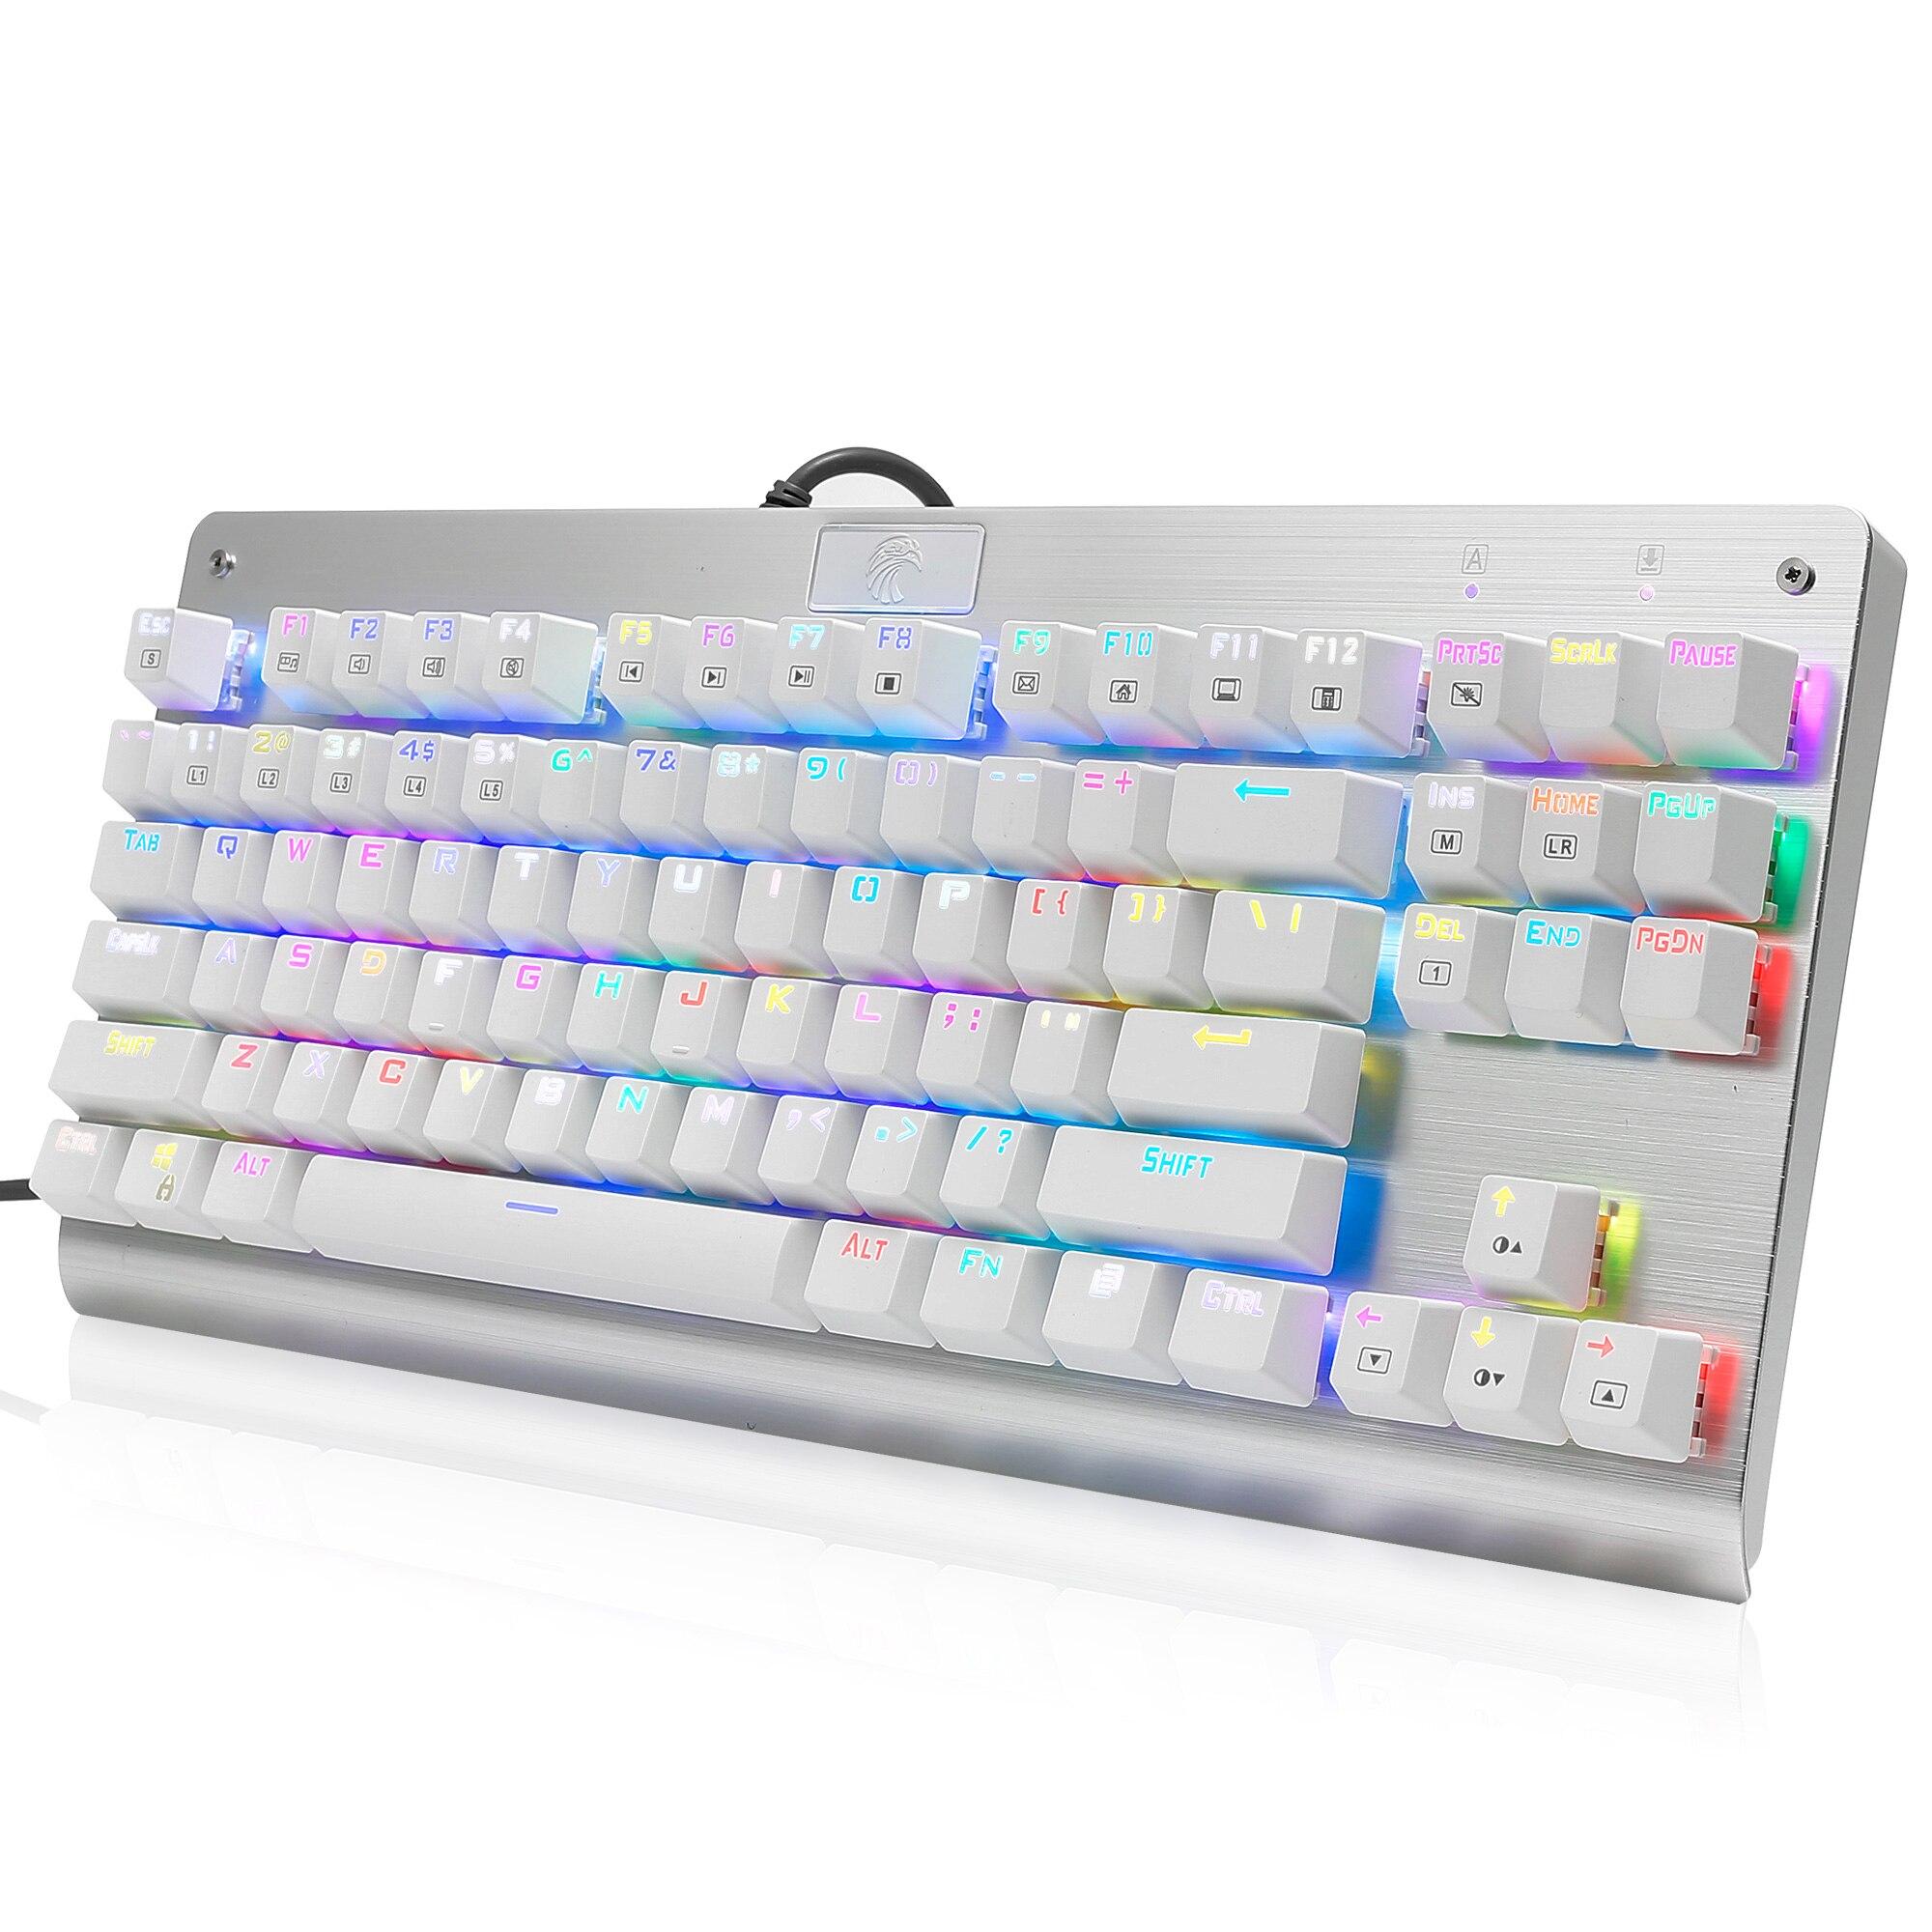 Z77 Eagle Mechanical Gaming Keyboard TKL 87 Keys RGB Backlit Outemu Blue Switch Anti-Ghosting Computer Keyboard For Gamer Typist